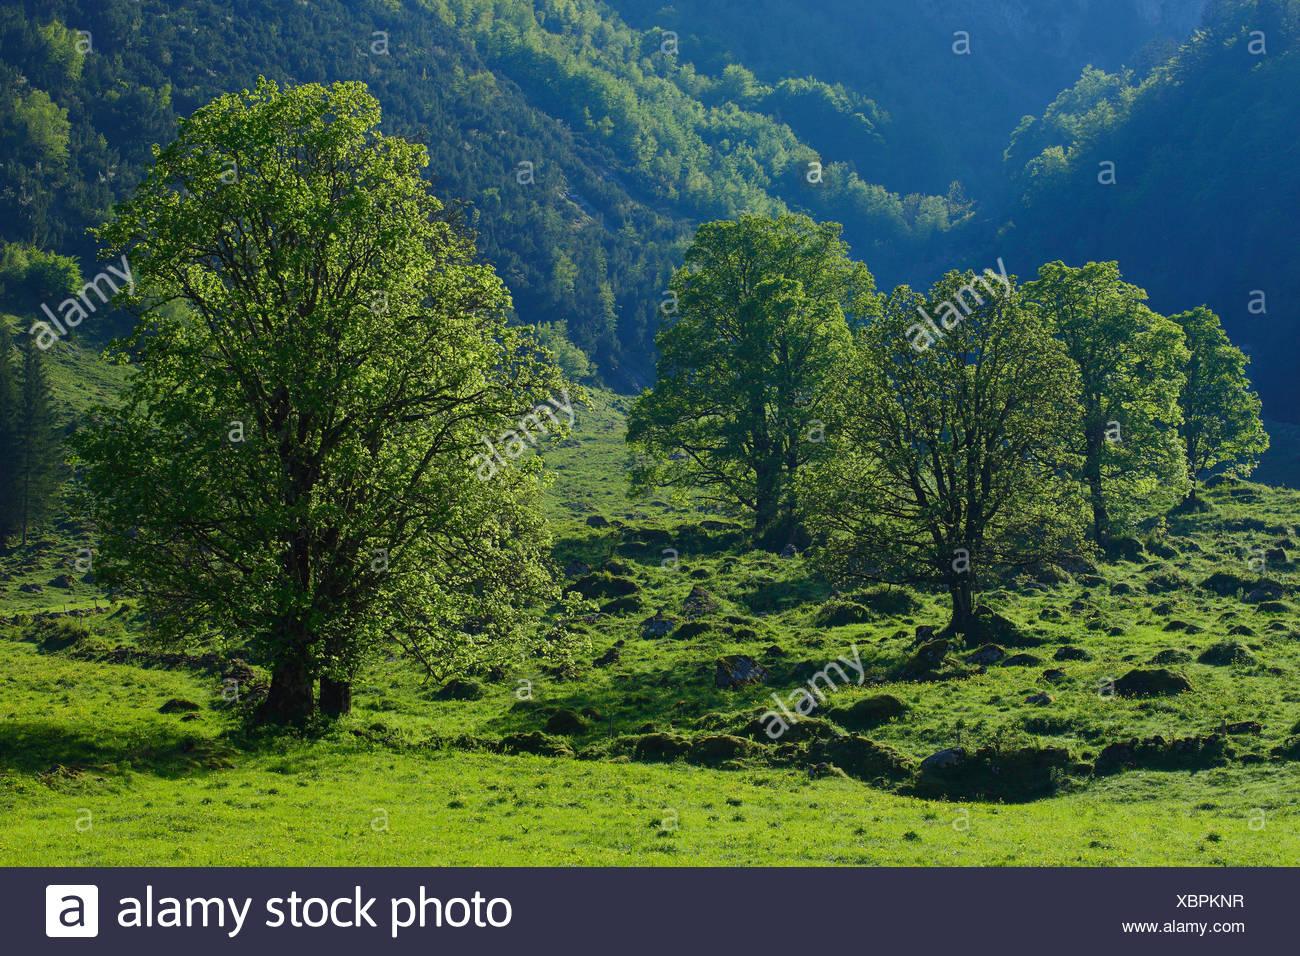 Acer Pseudoplatanus, Ahorn, Baum, Berg, Bergahorn, Berge, Bäume, Frühling, Bergen, Kanton Glarus, Schweiz, grün Stockfoto